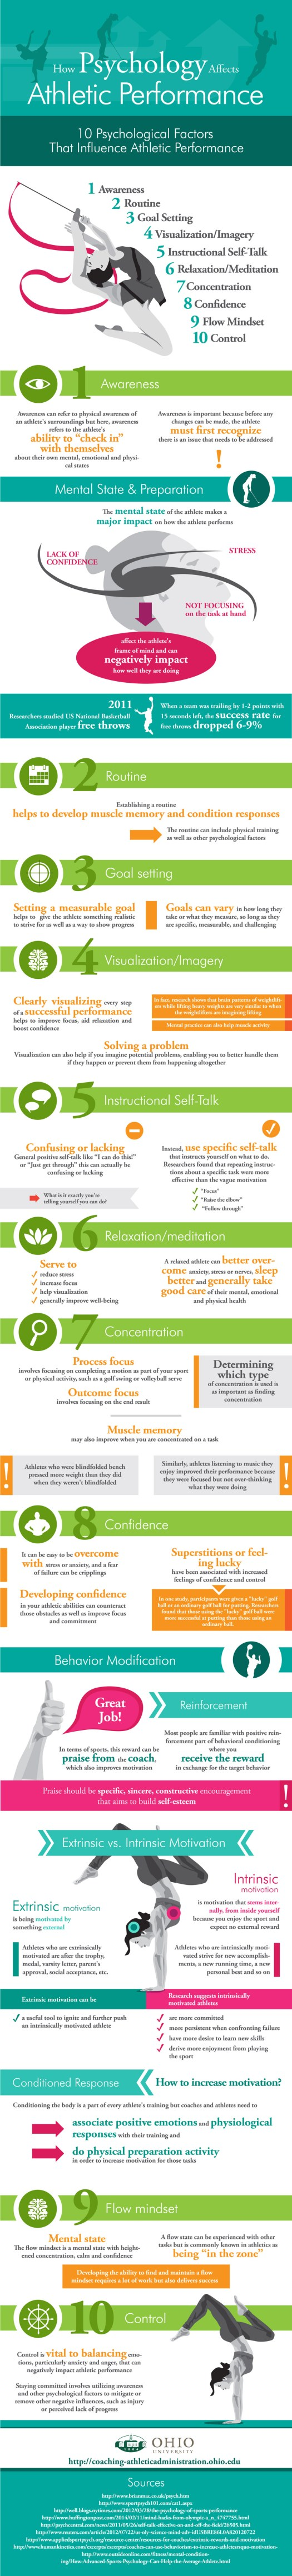 OU-MCE-Sports-Psychology-Infographic